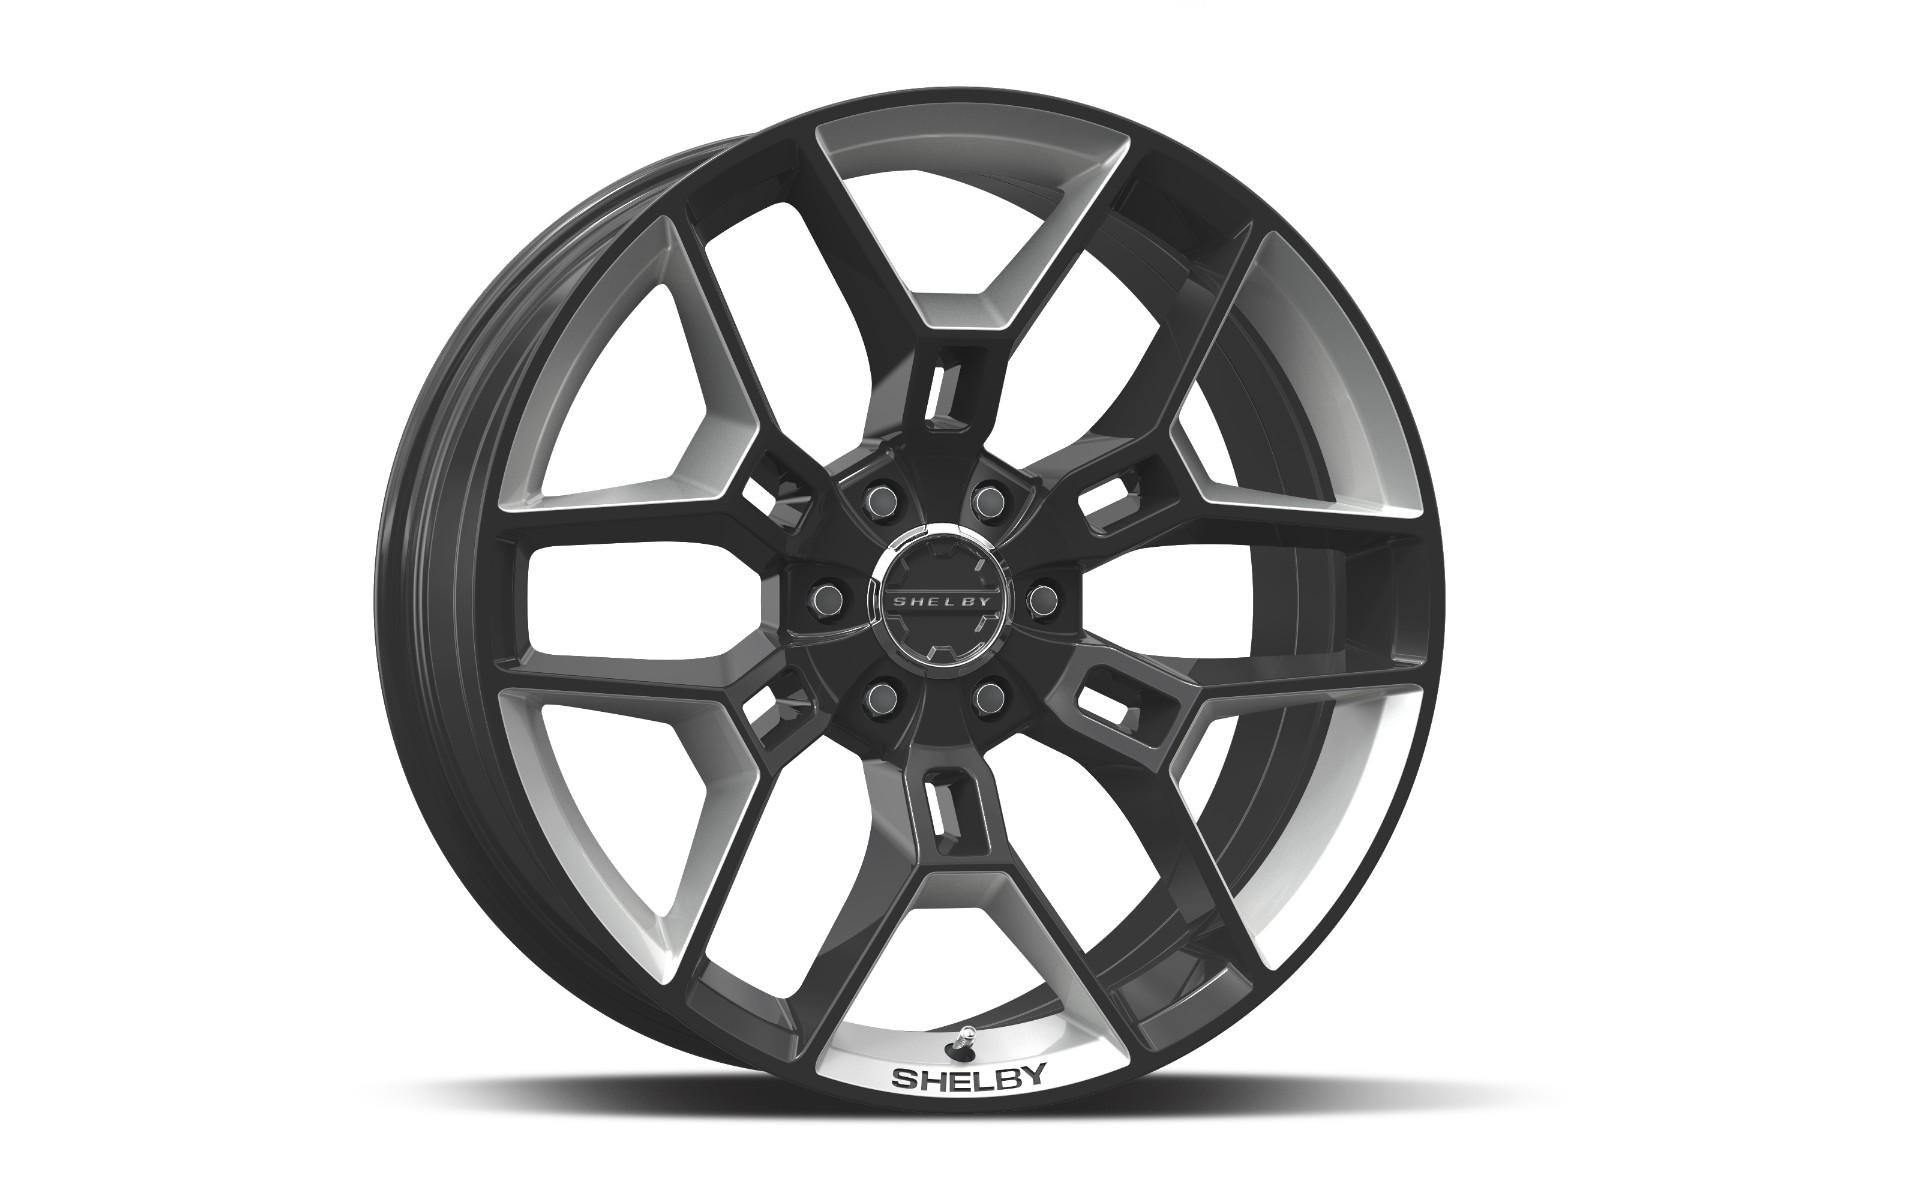 Carroll Shelby Wheels CS 45 - Black w/Hyper Silver Inserts Rim